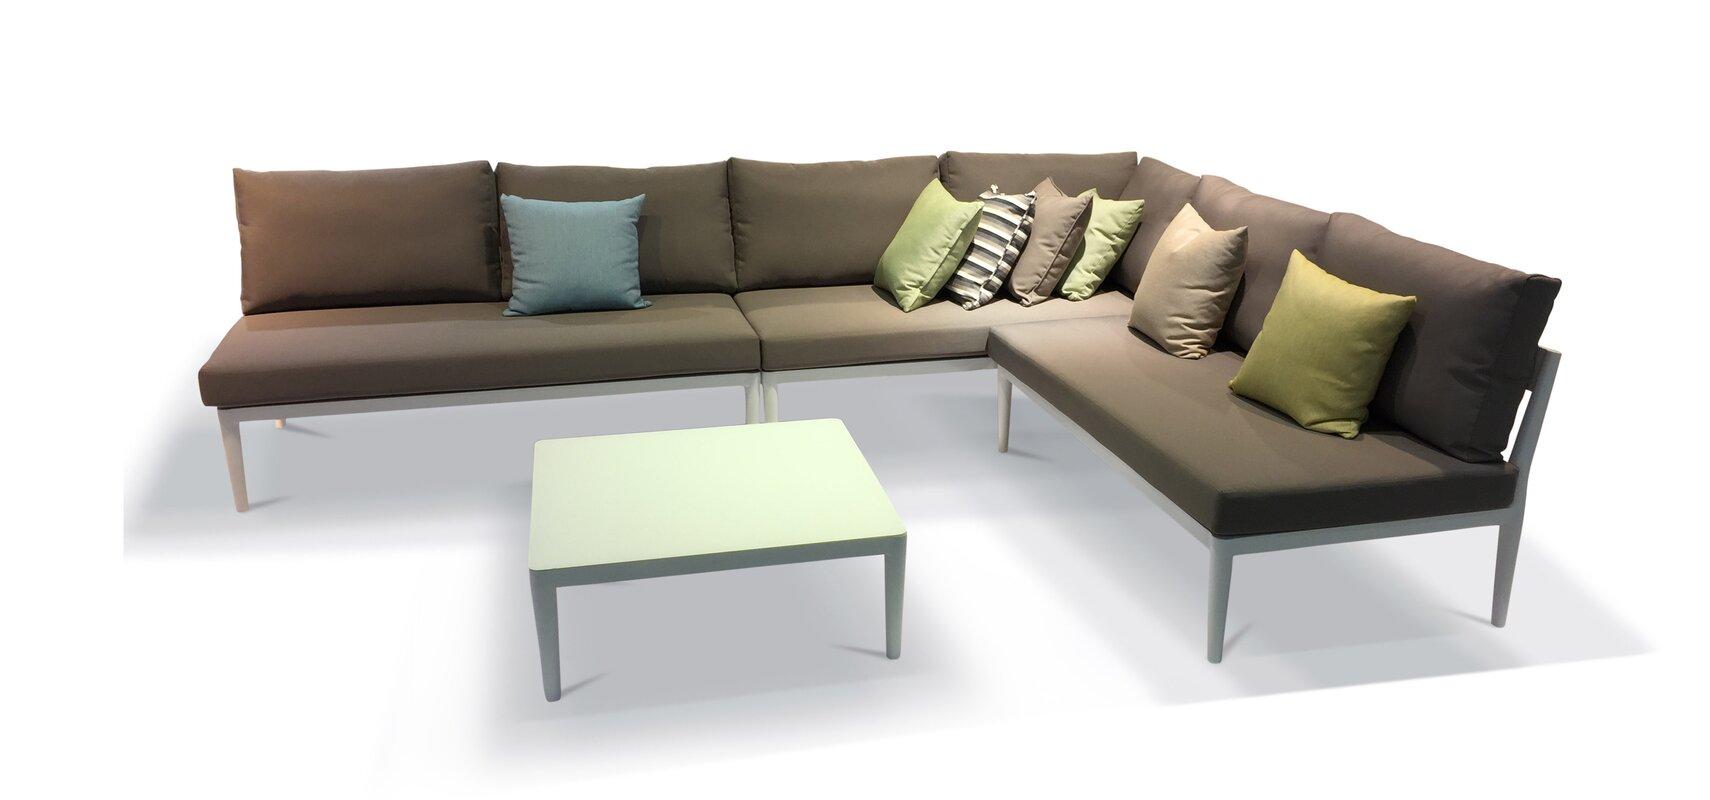 Living Room Group Sets Urban Furnishings Palazzo 4 Piece Deep Seating Set U0026 Reviews